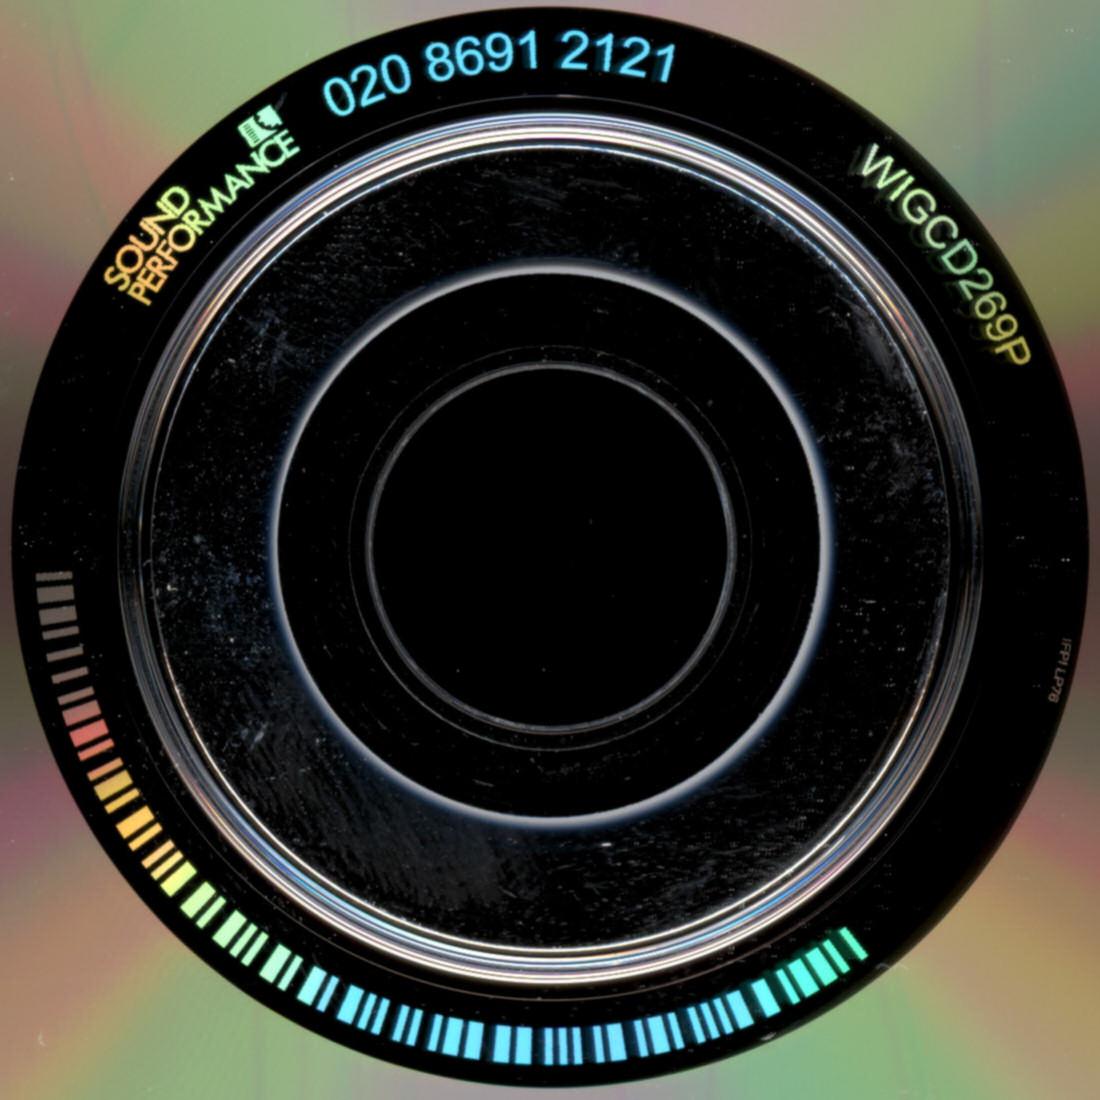 domino recording company wolf u0027s kompaktkiste